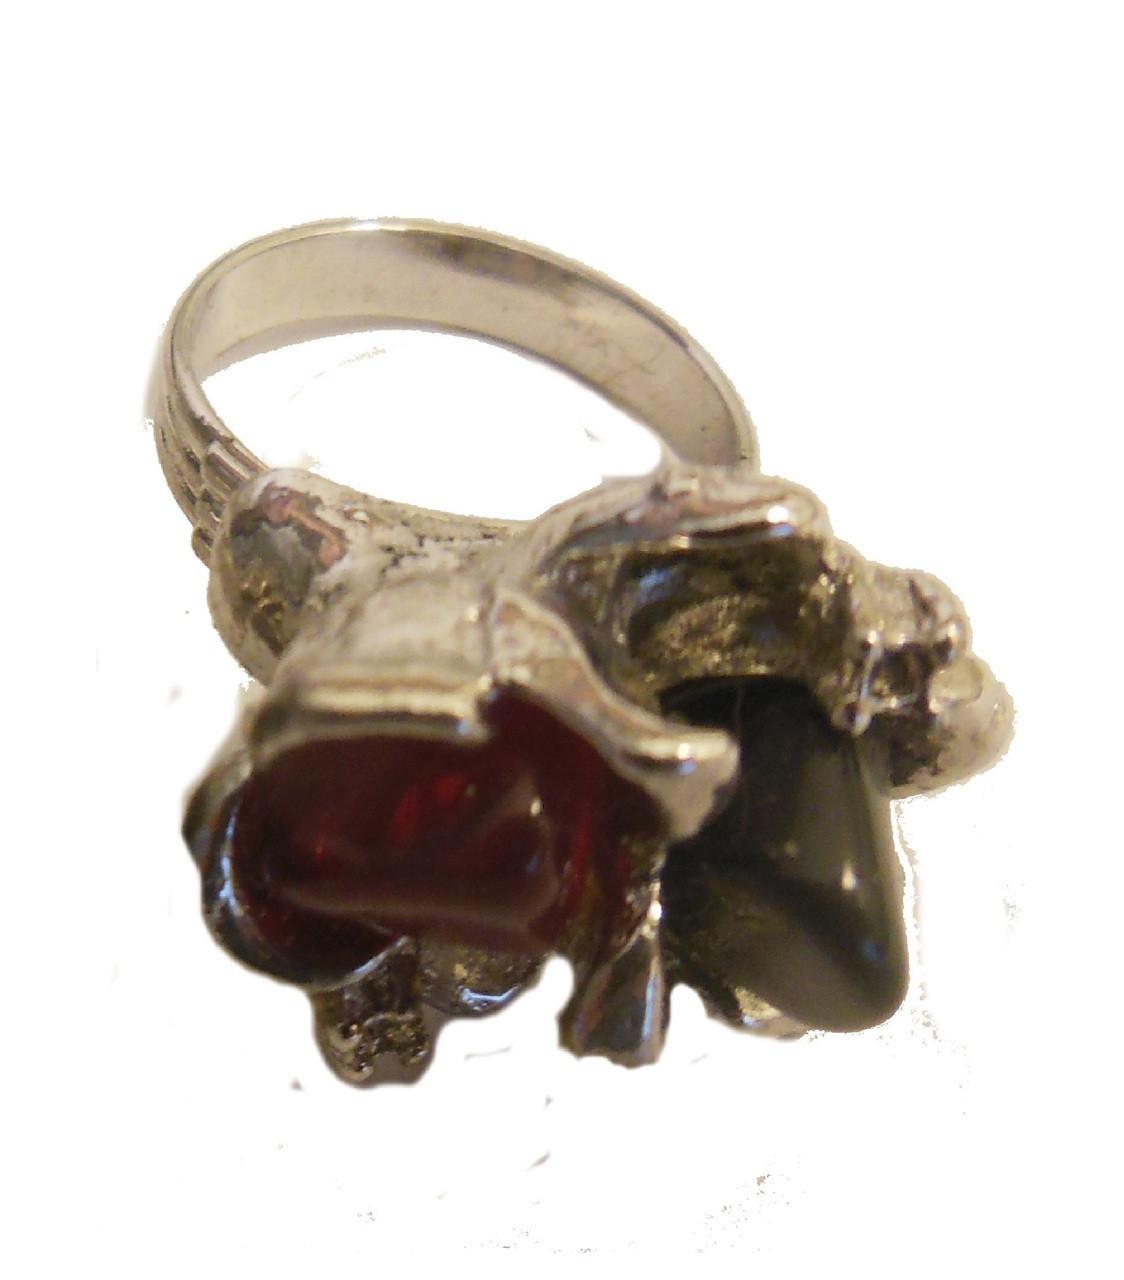 Vintage 2 Stone Ruffled Ring- Garnet and Tourmaline